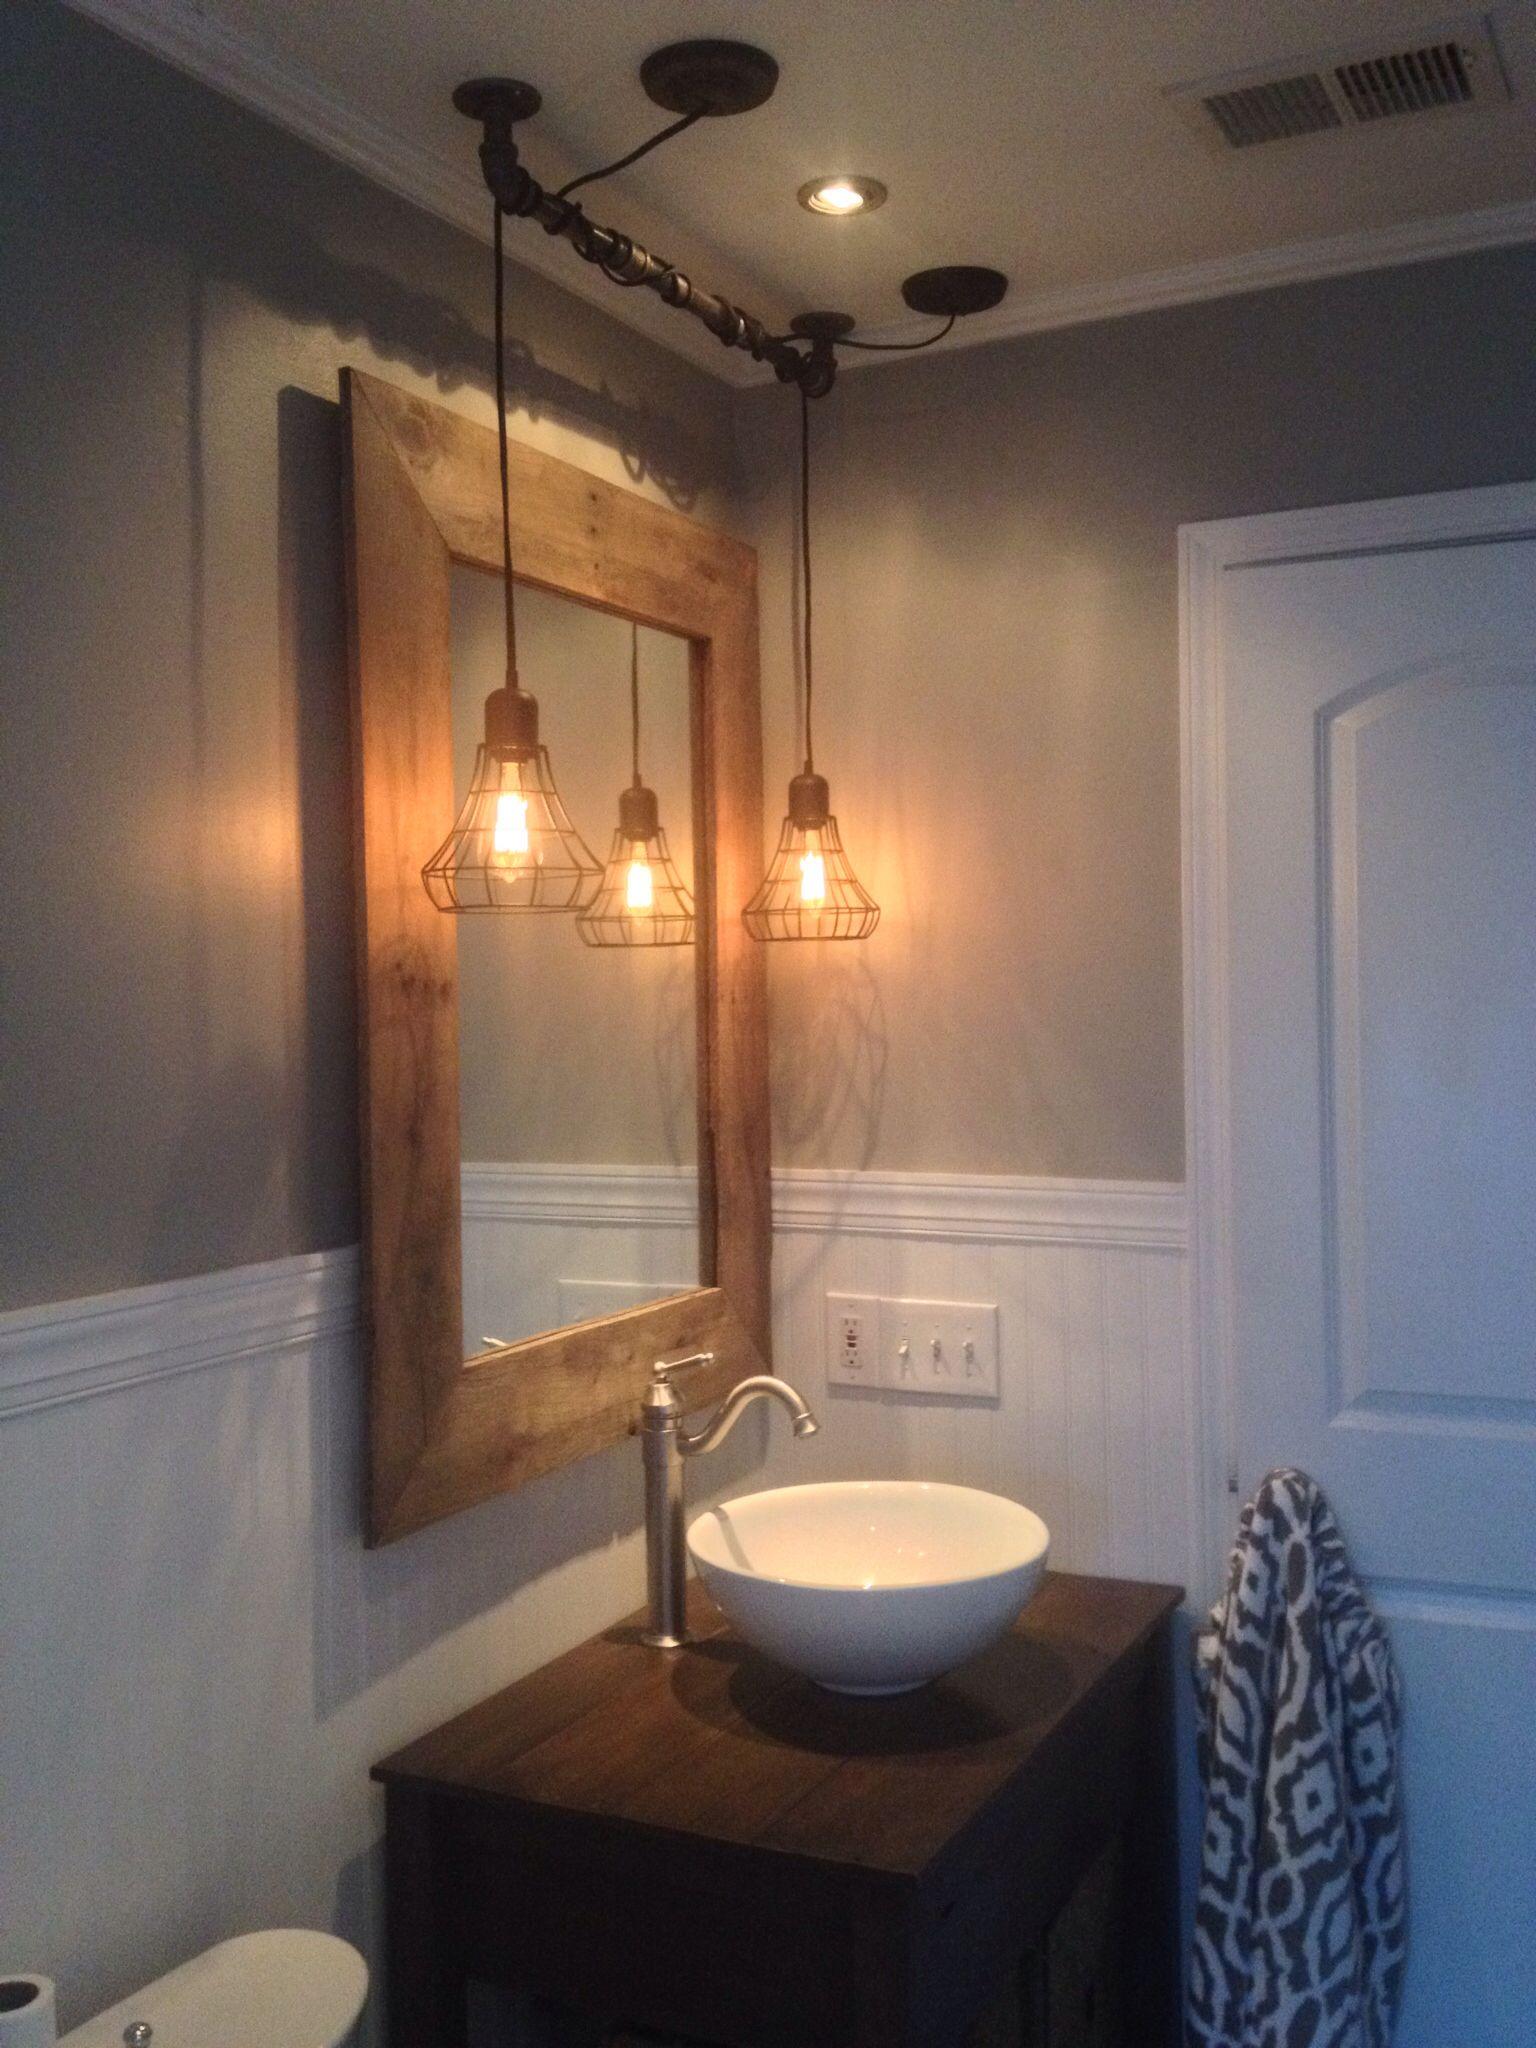 Vintage Reclaimed Wood Mirror And Vanity With Industrial